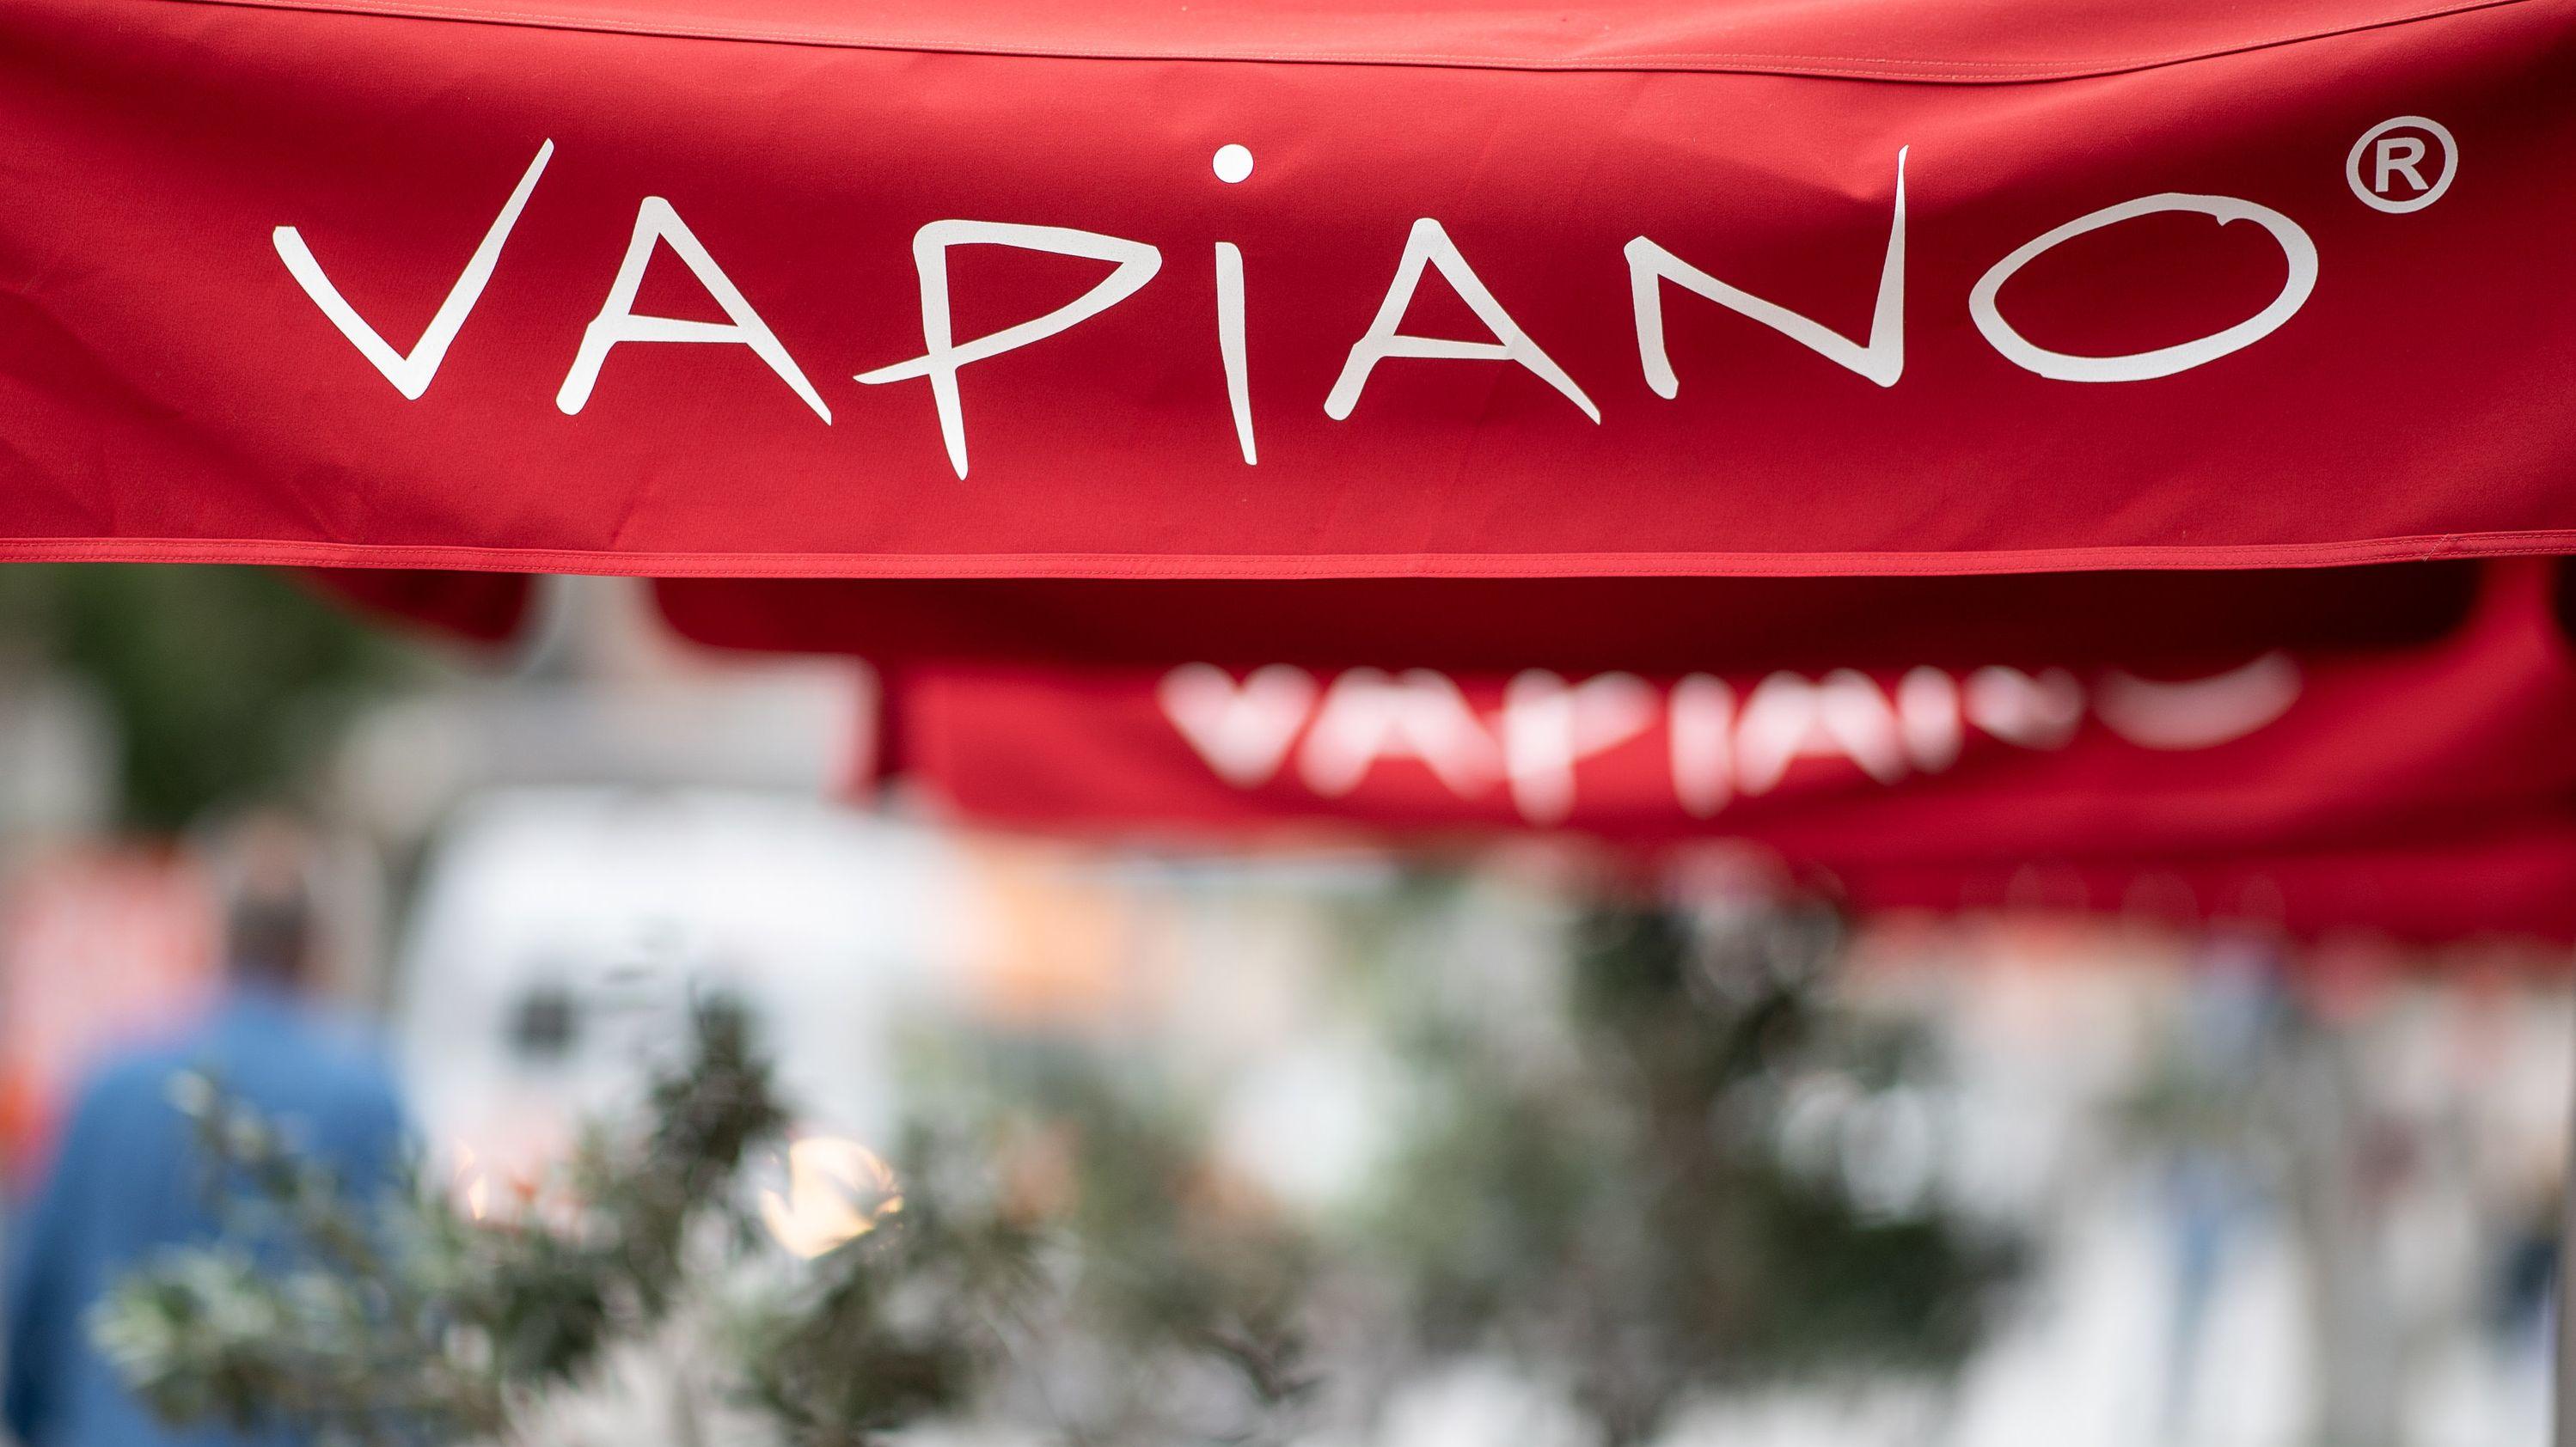 Das Logo der Restaurant-Kette Vapiano.